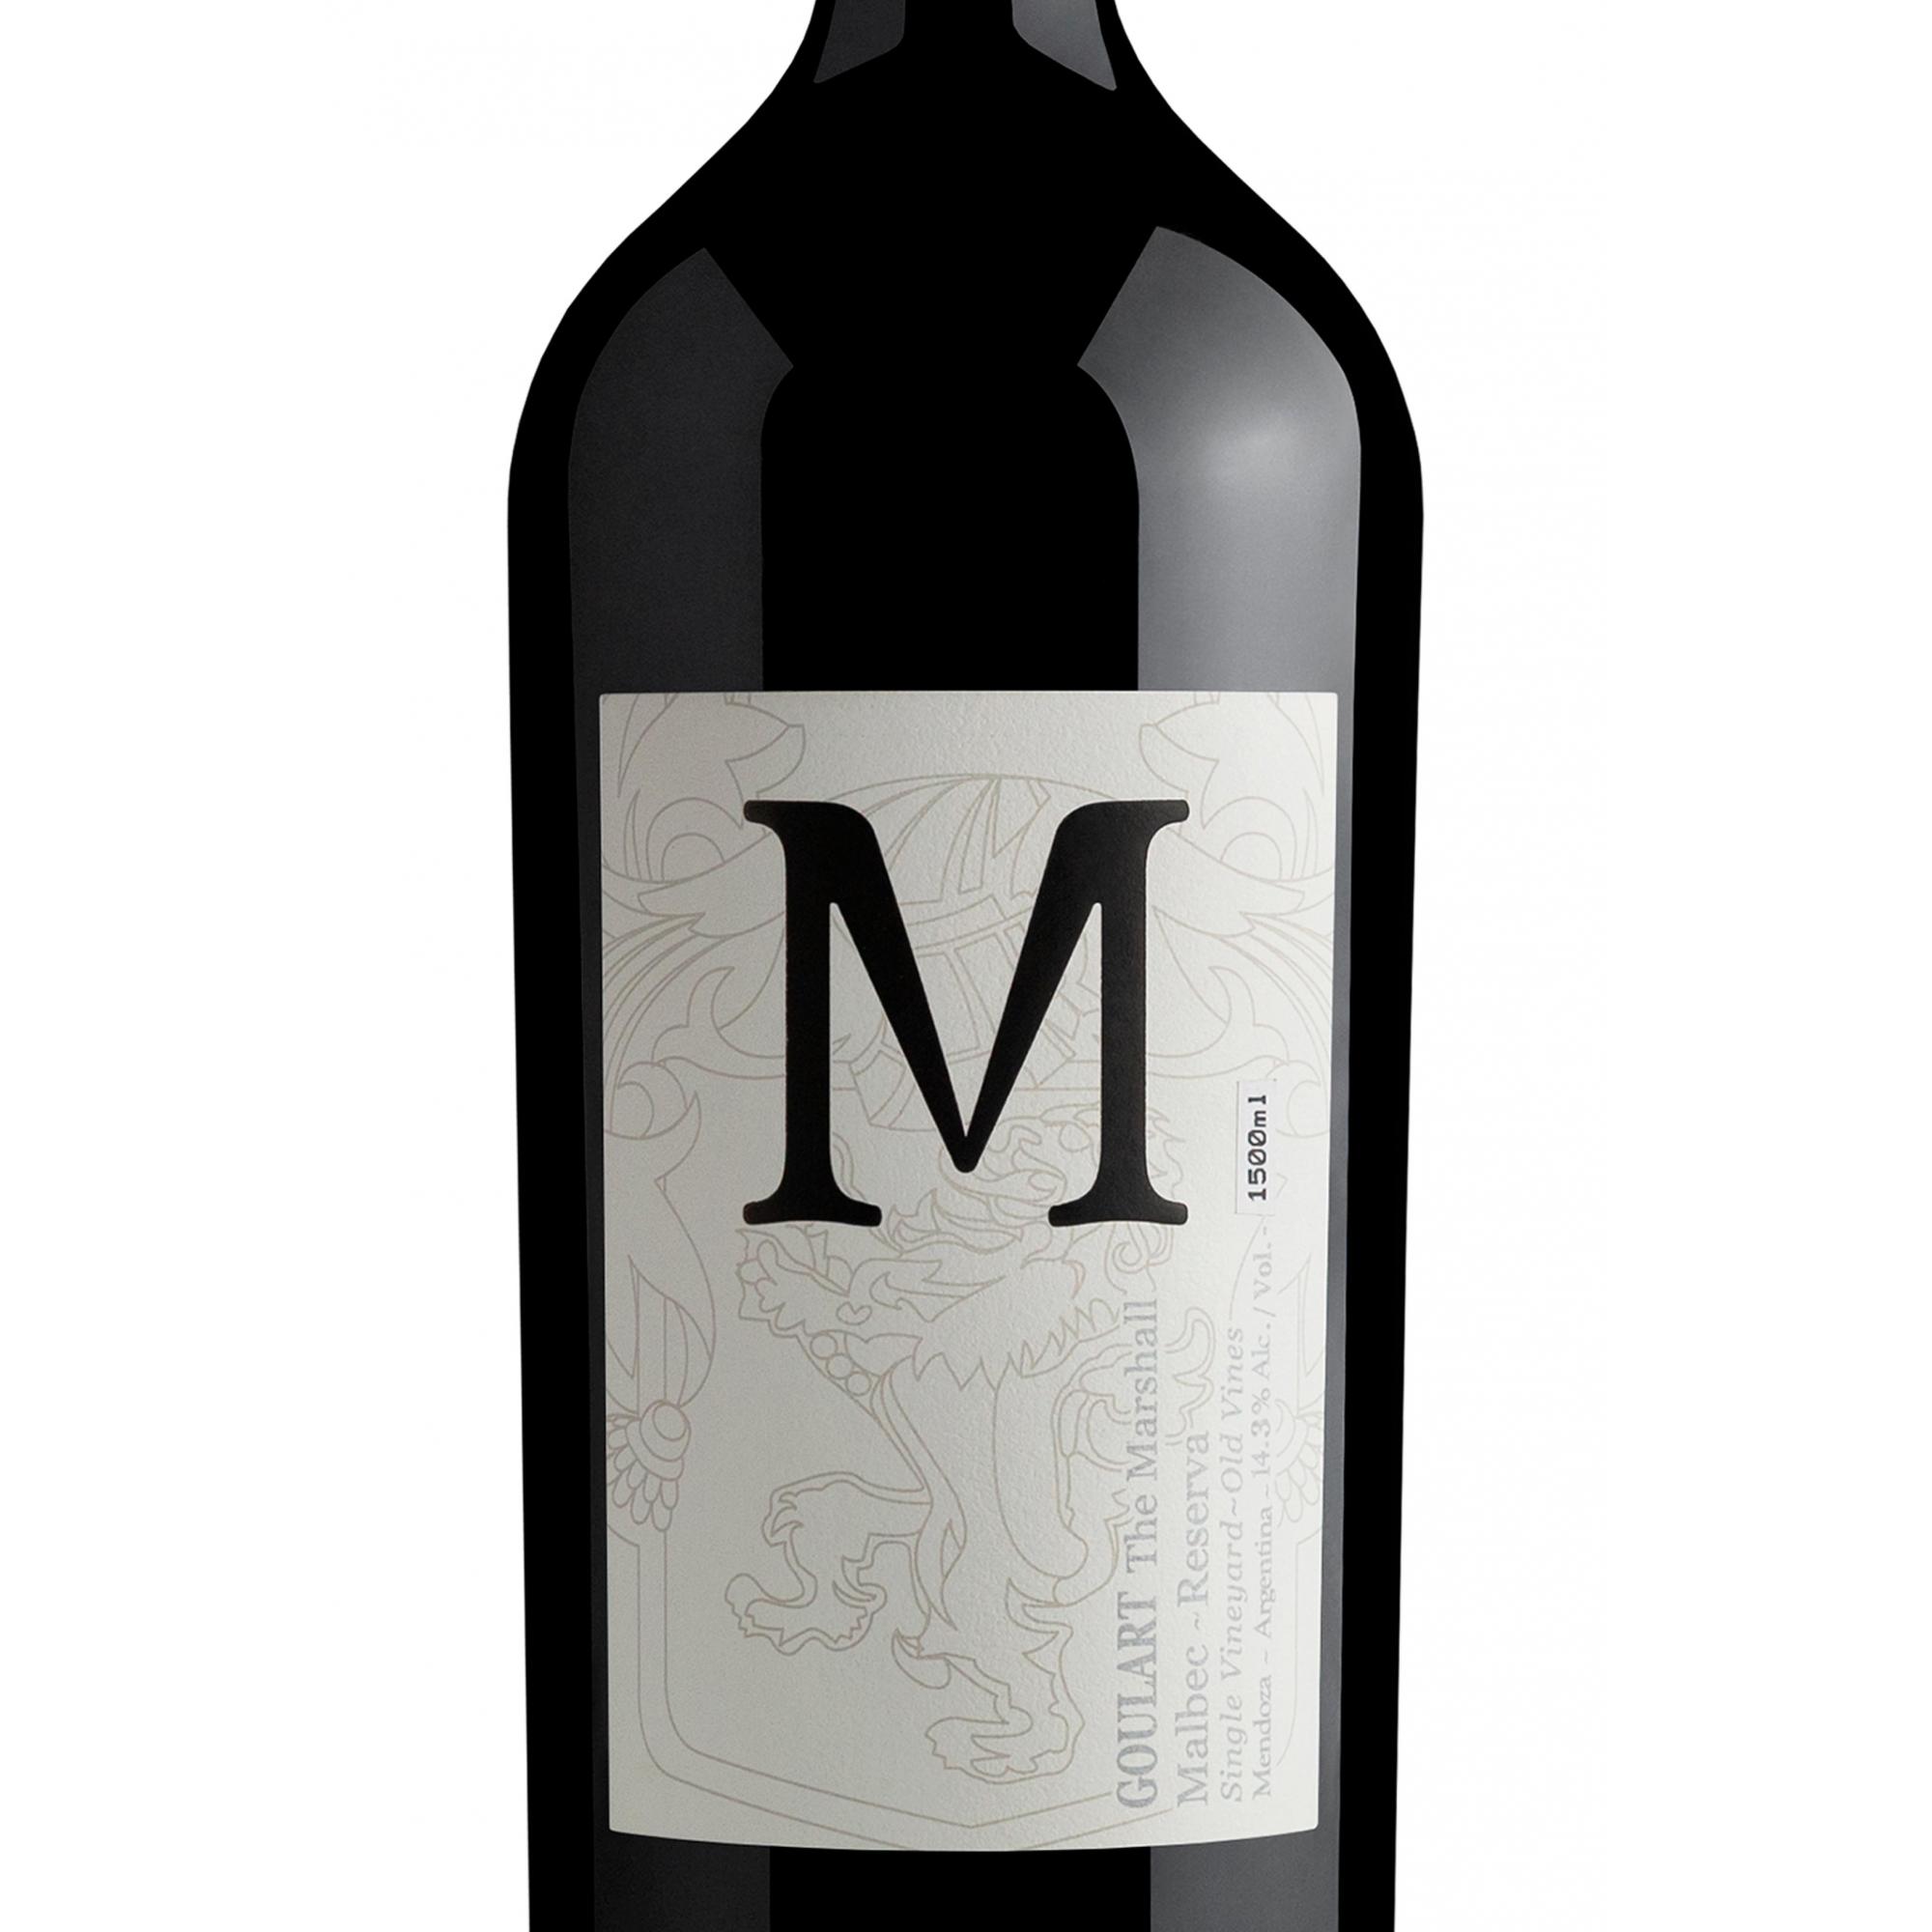 Goulart M The Marshall Single Vineyard  Malbec 2017 - 1,500ml